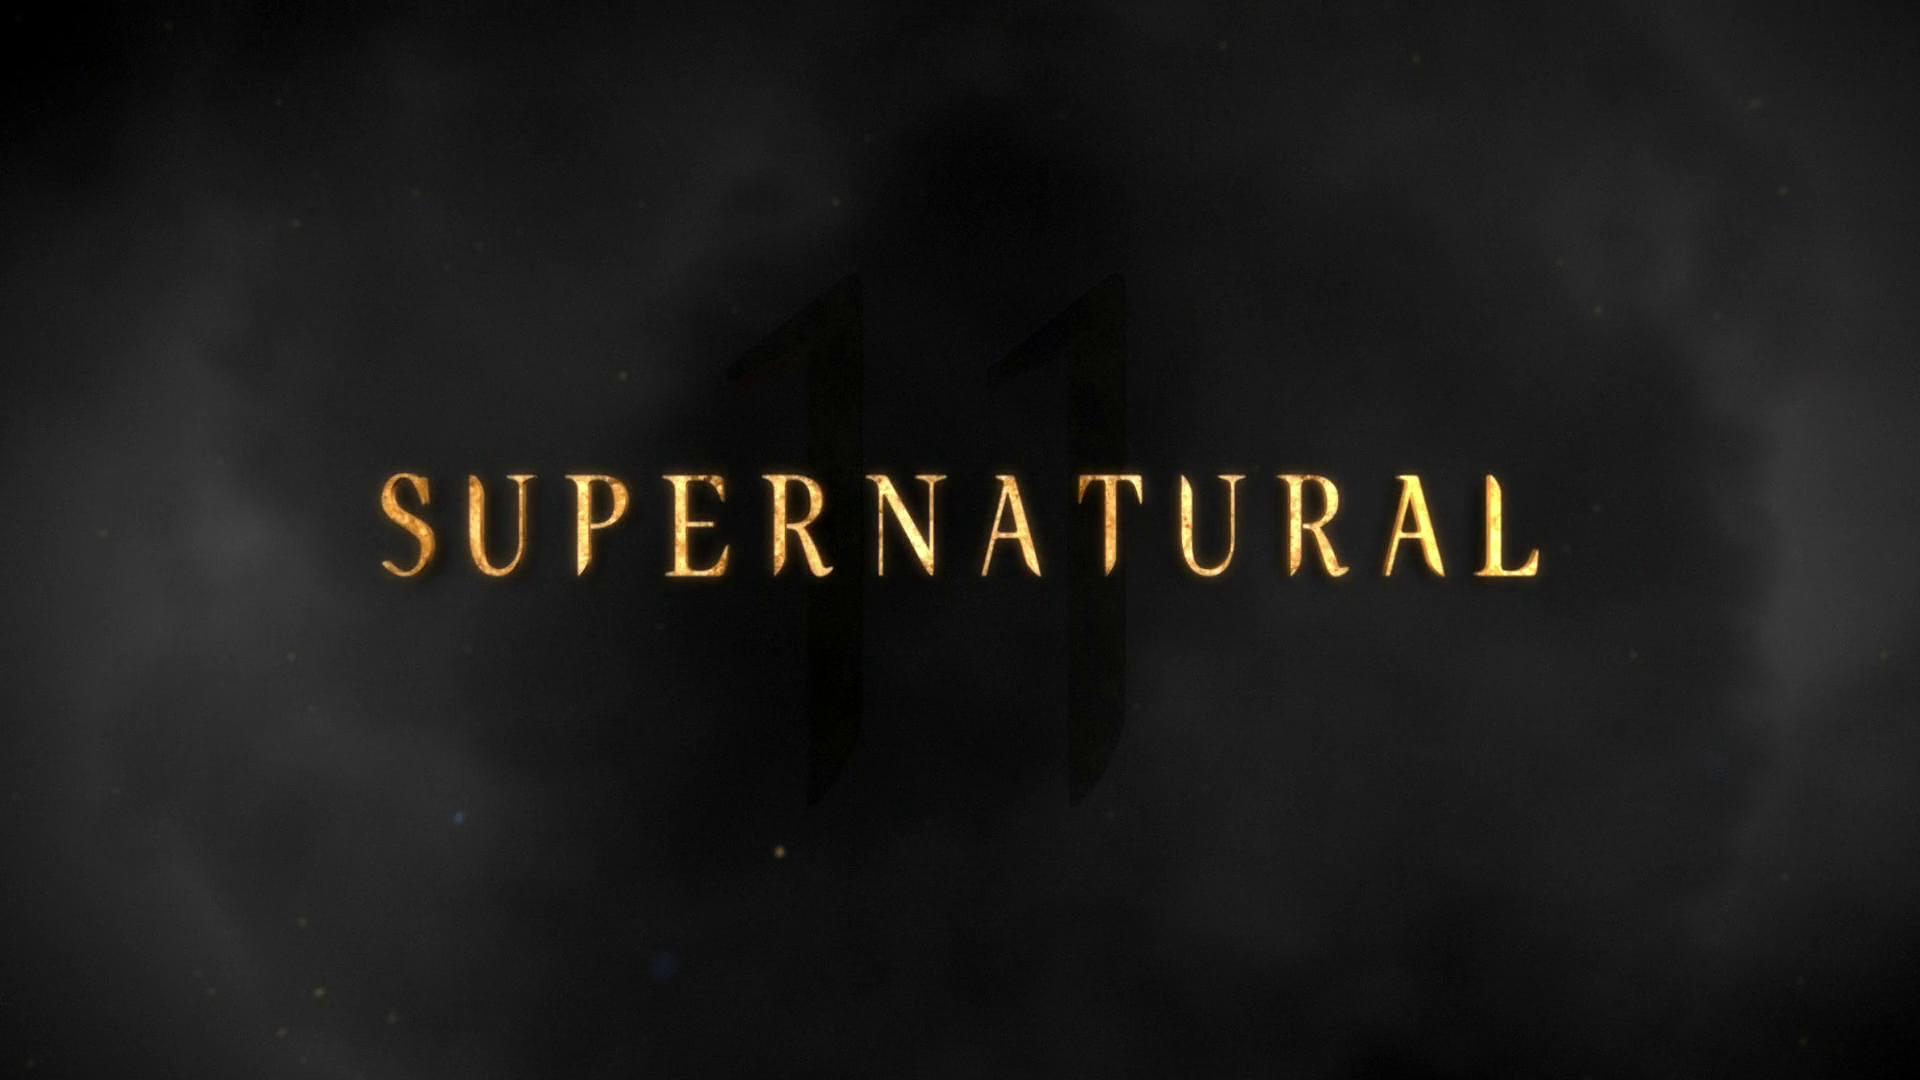 Good Wallpaper Logo Supernatural - emblem-supernatural-season-4-png-logo-10  2018_341084.png